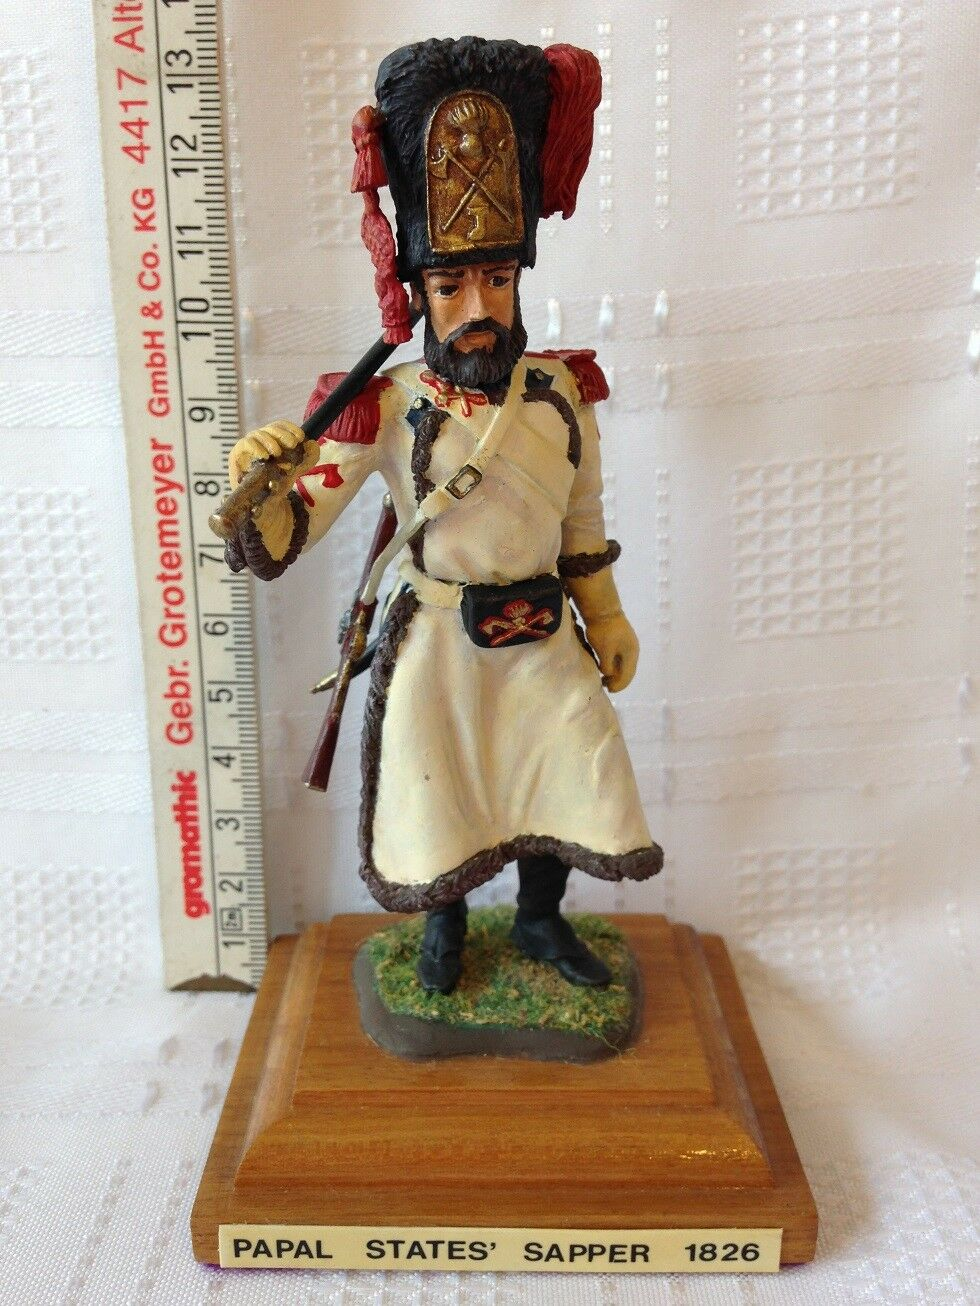 PAPAL STATE SAPPER - 1826. 110mm Die-Cast Figure. FREE UK POSTAGE.